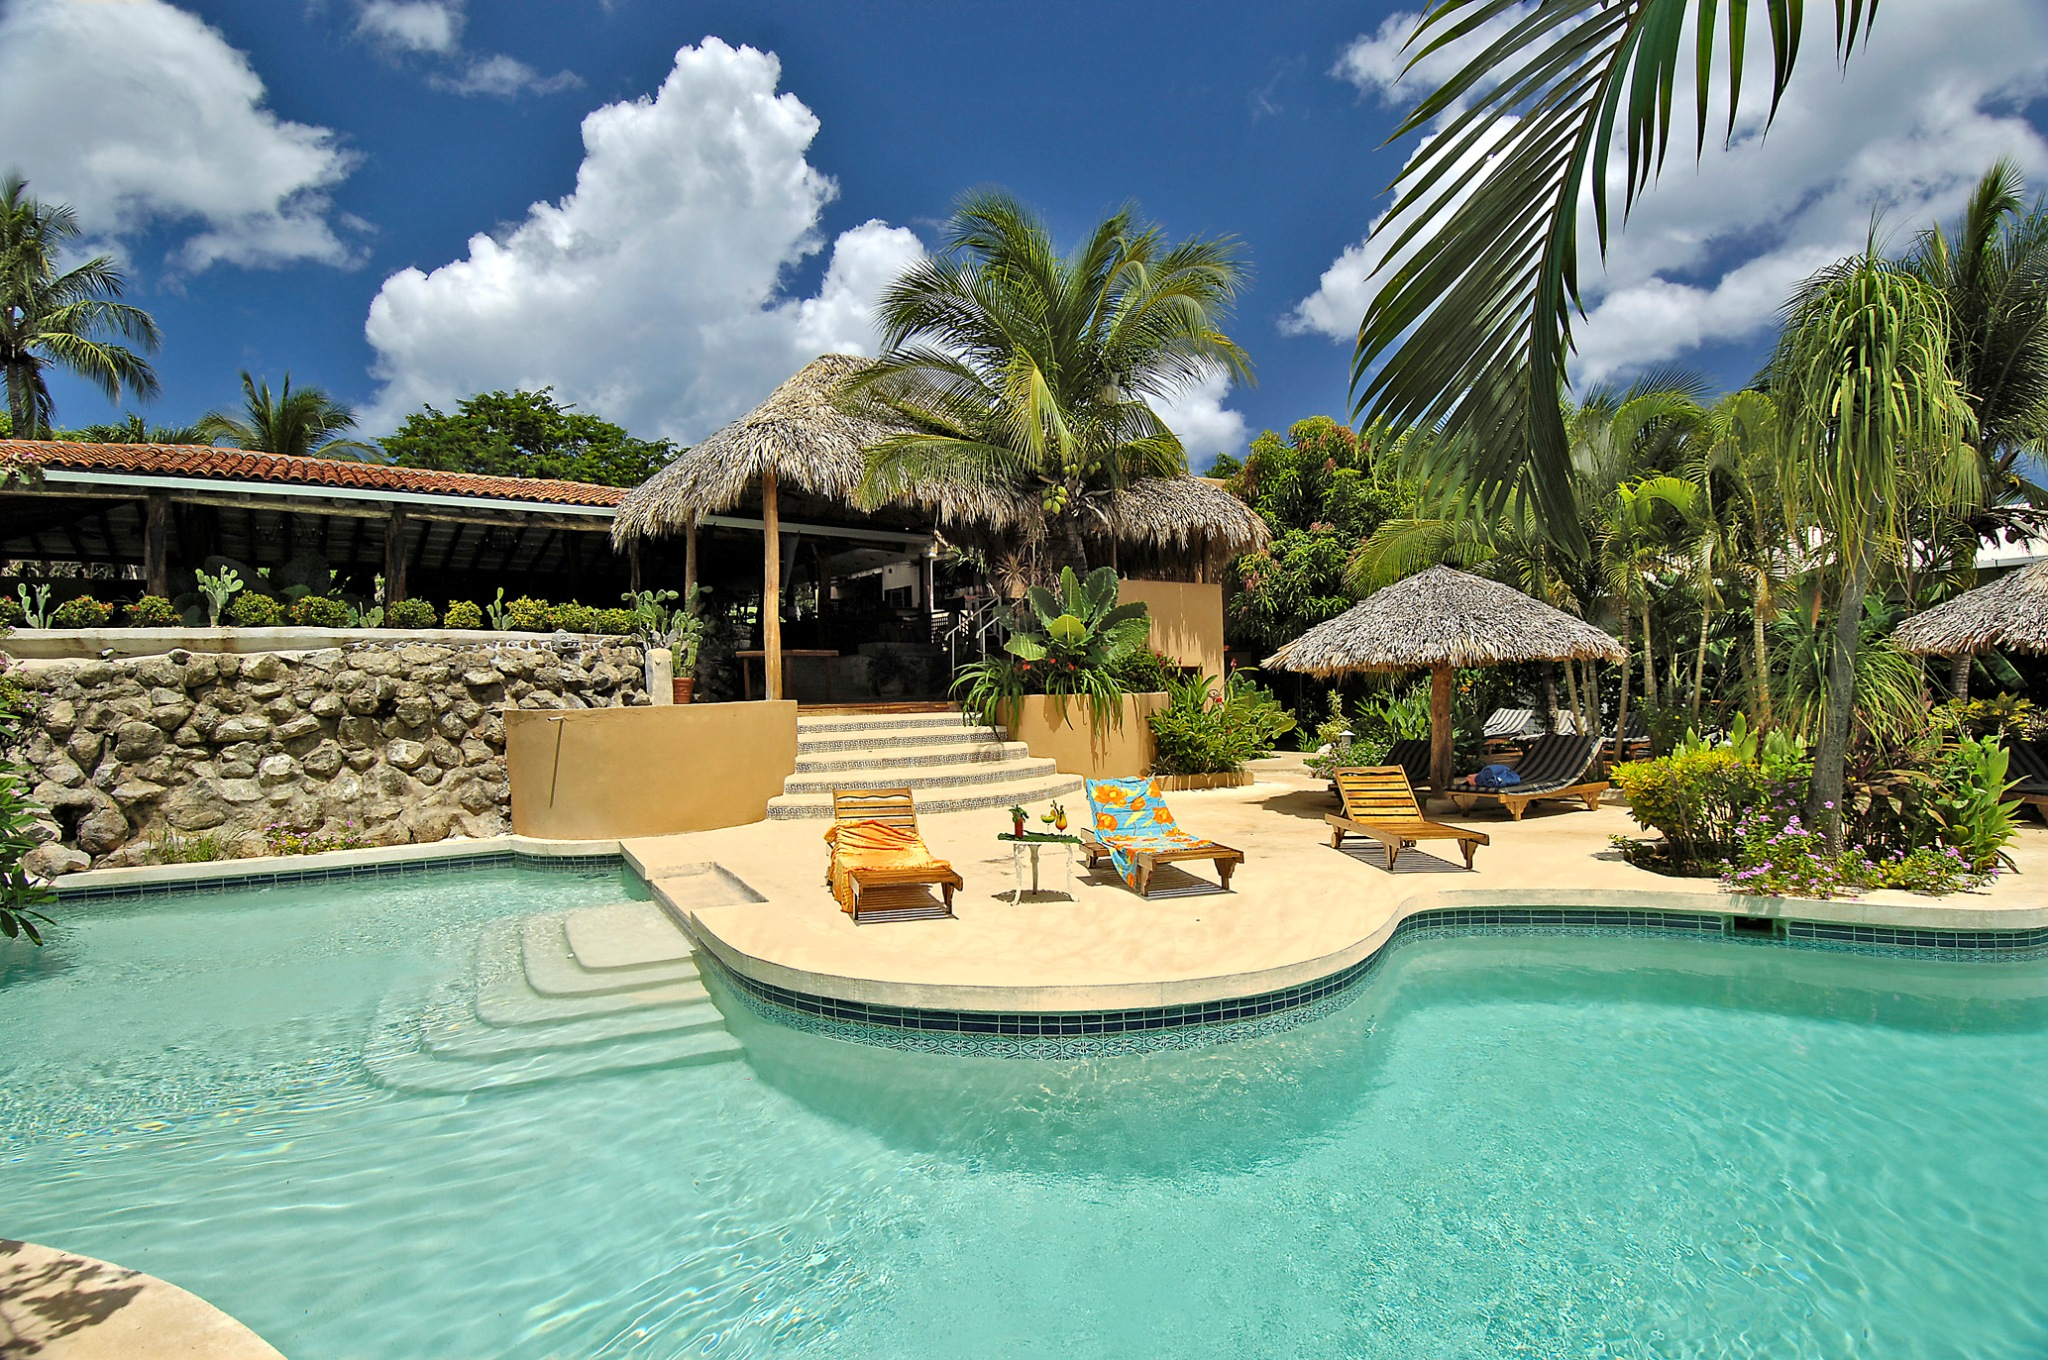 Hotel Playa Garden Alcudia Bilder